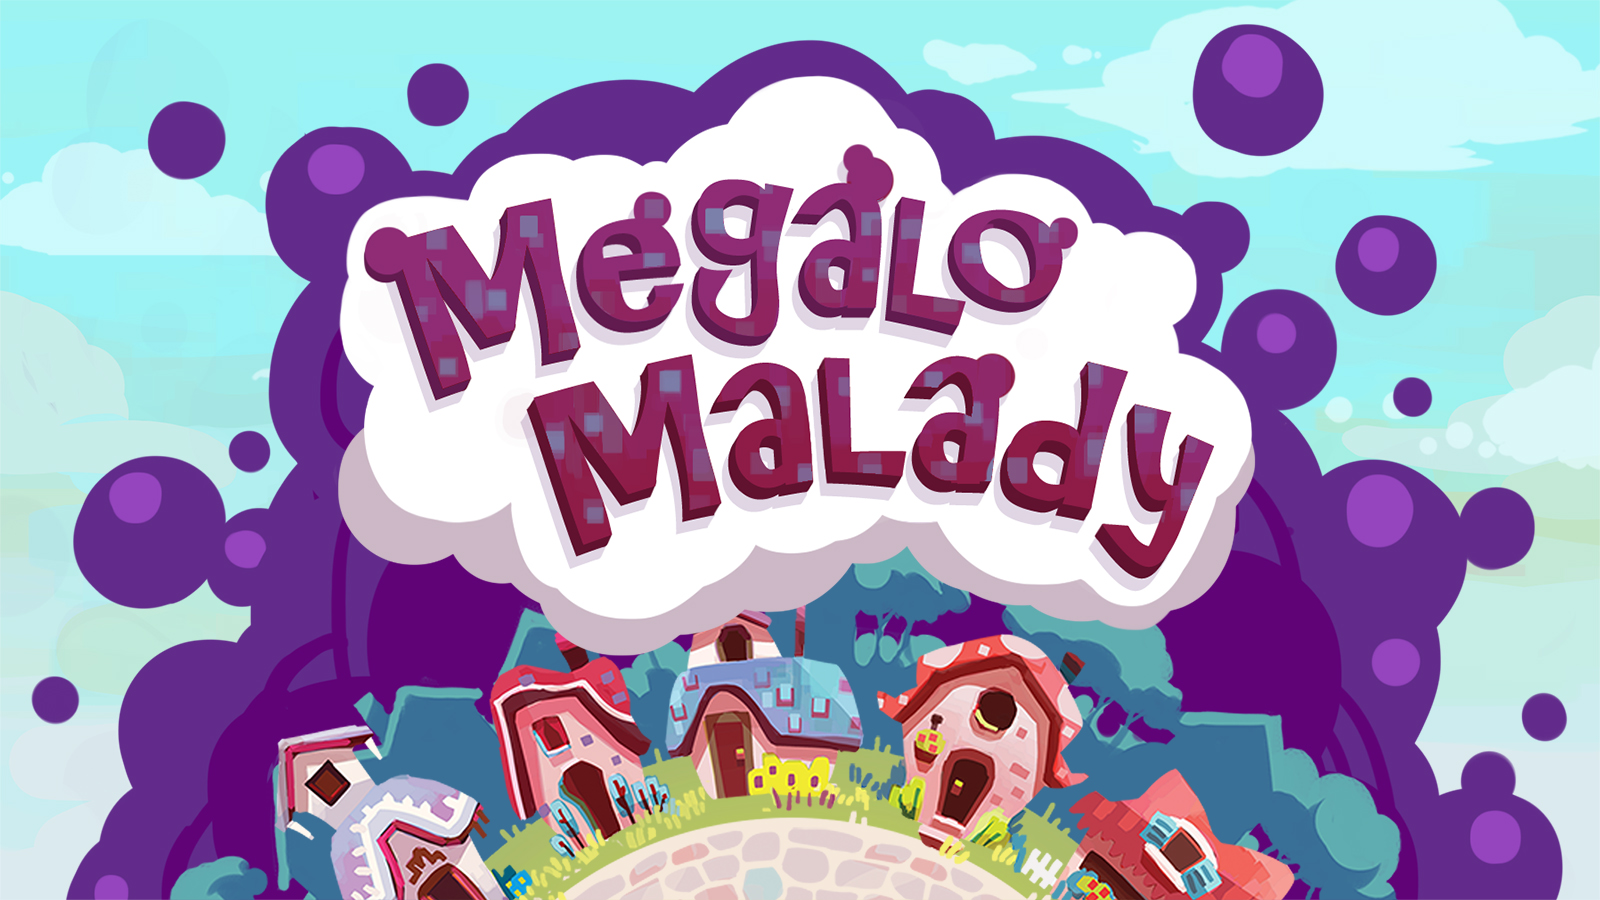 Megalomalady_CrossPromo1_1600x900.jpg